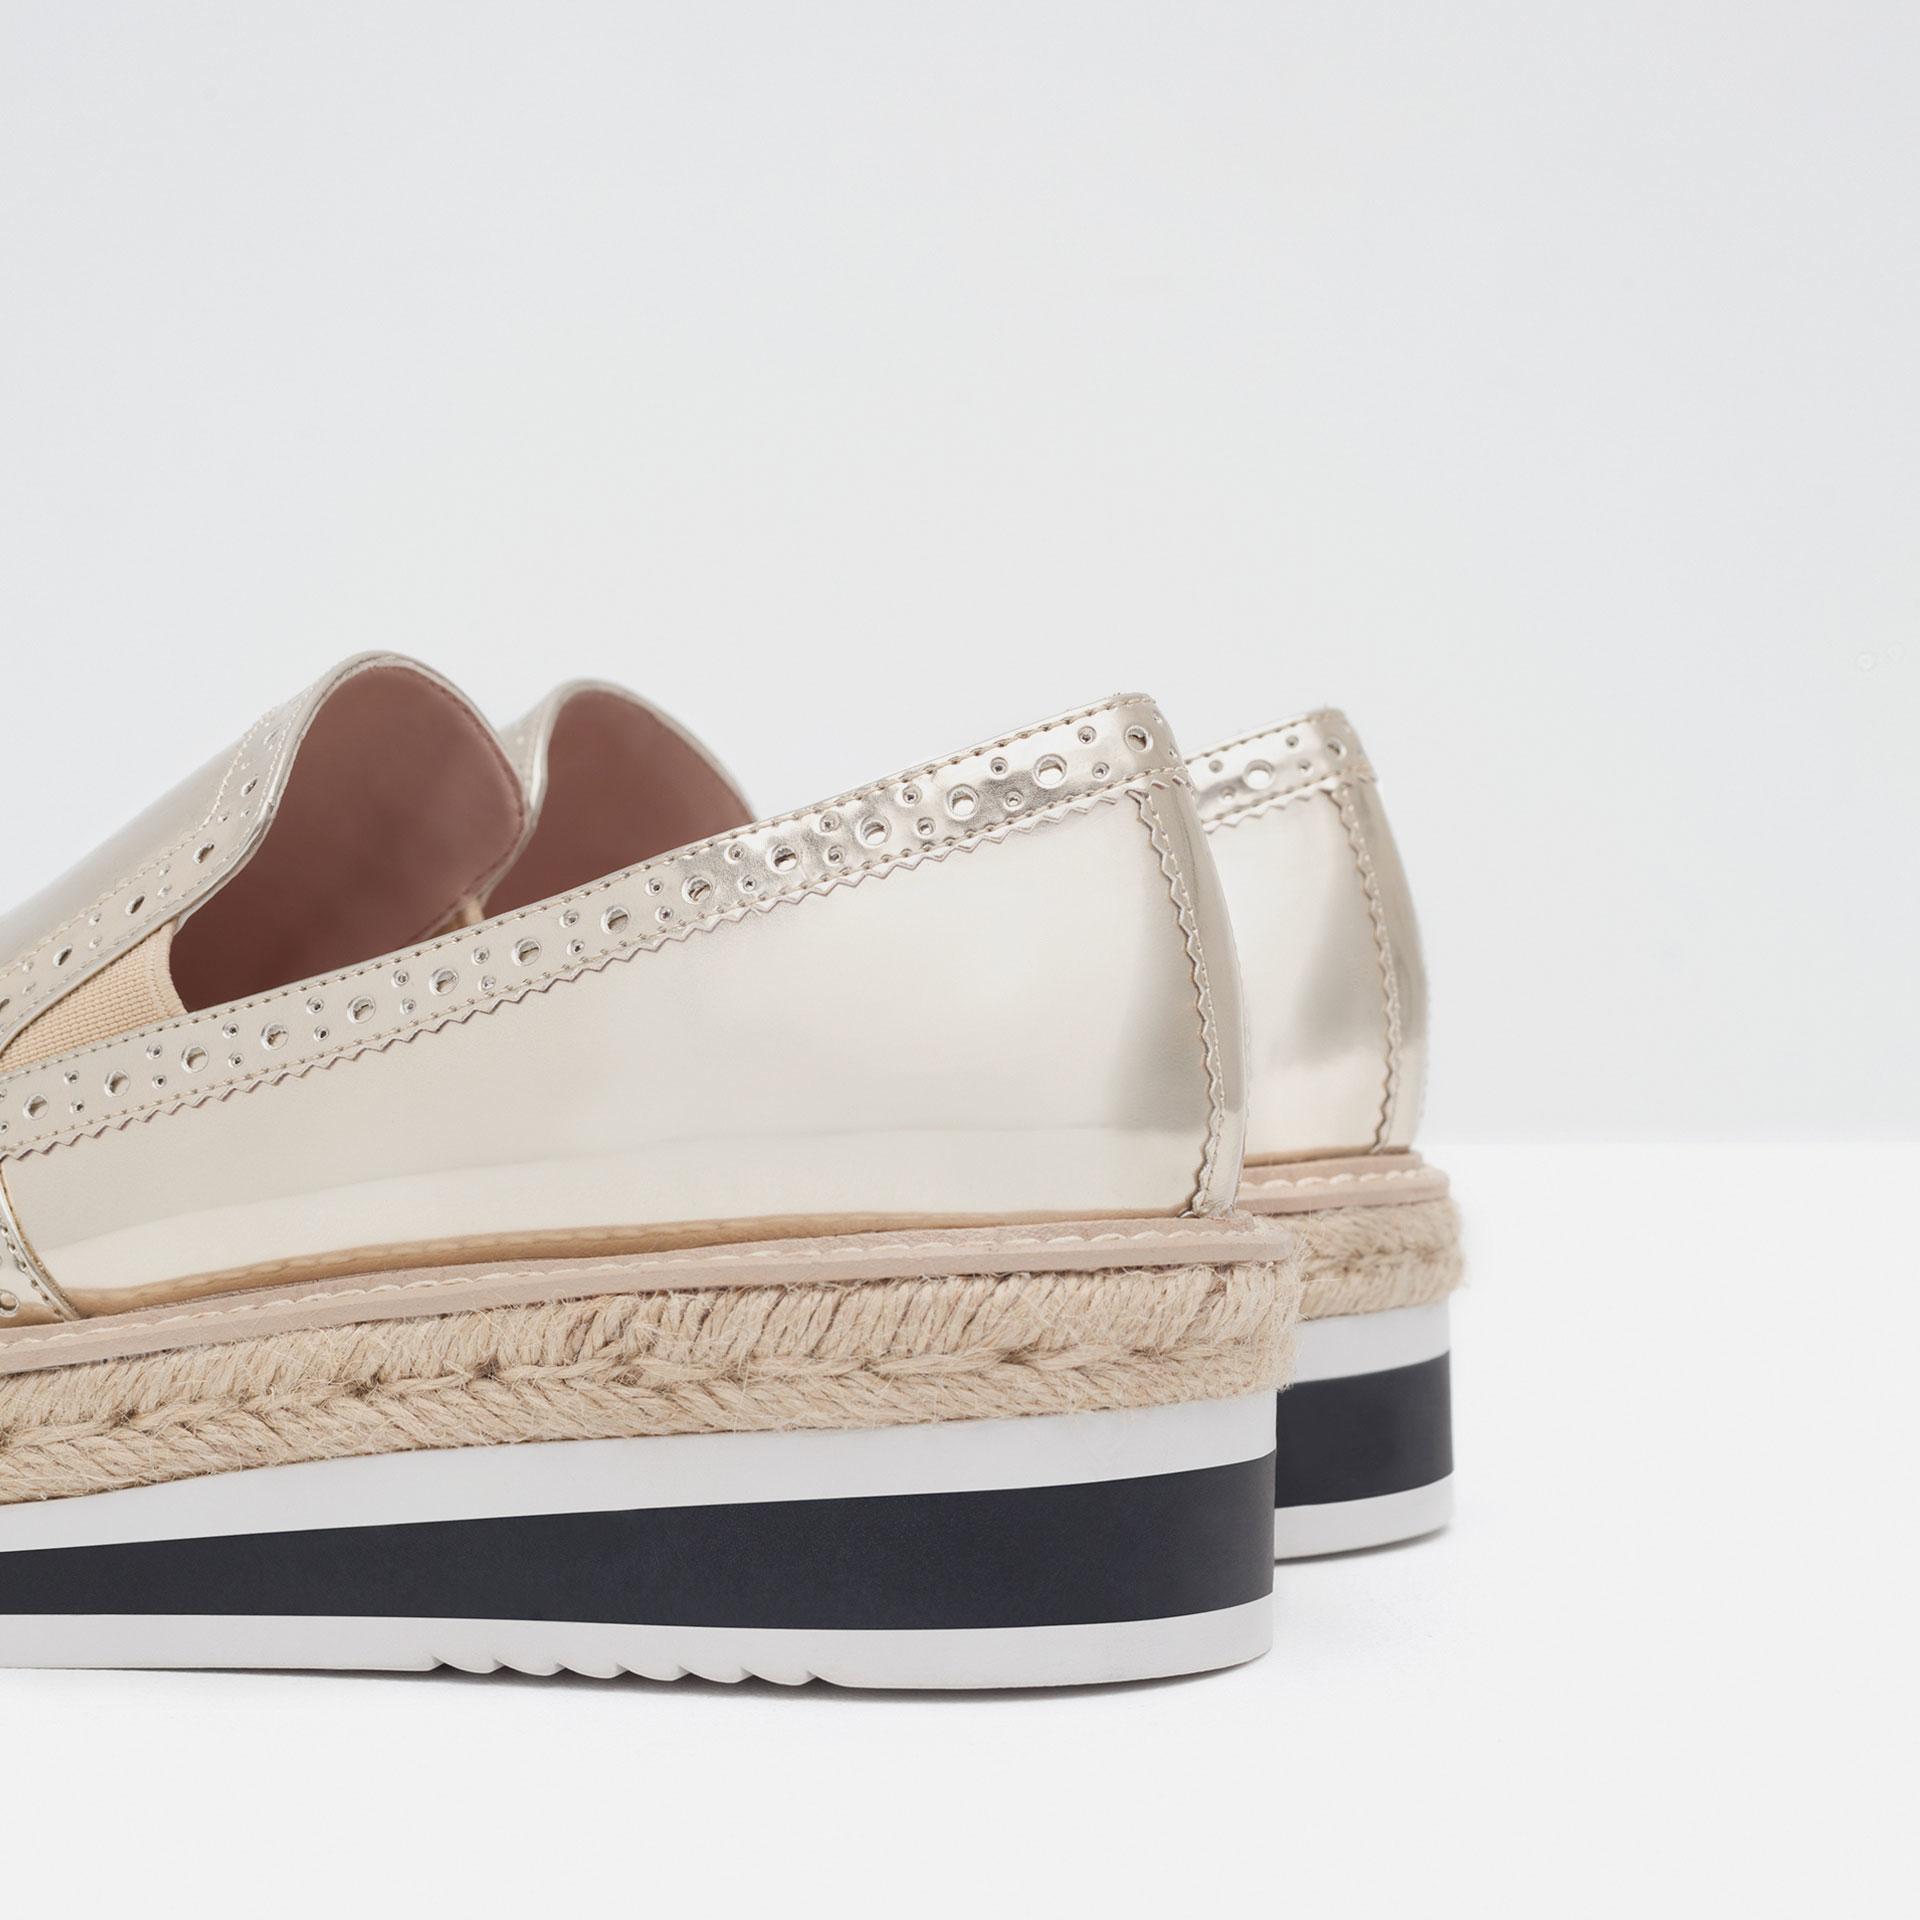 Zara Flat Platform Shoes in Metallic | Lyst